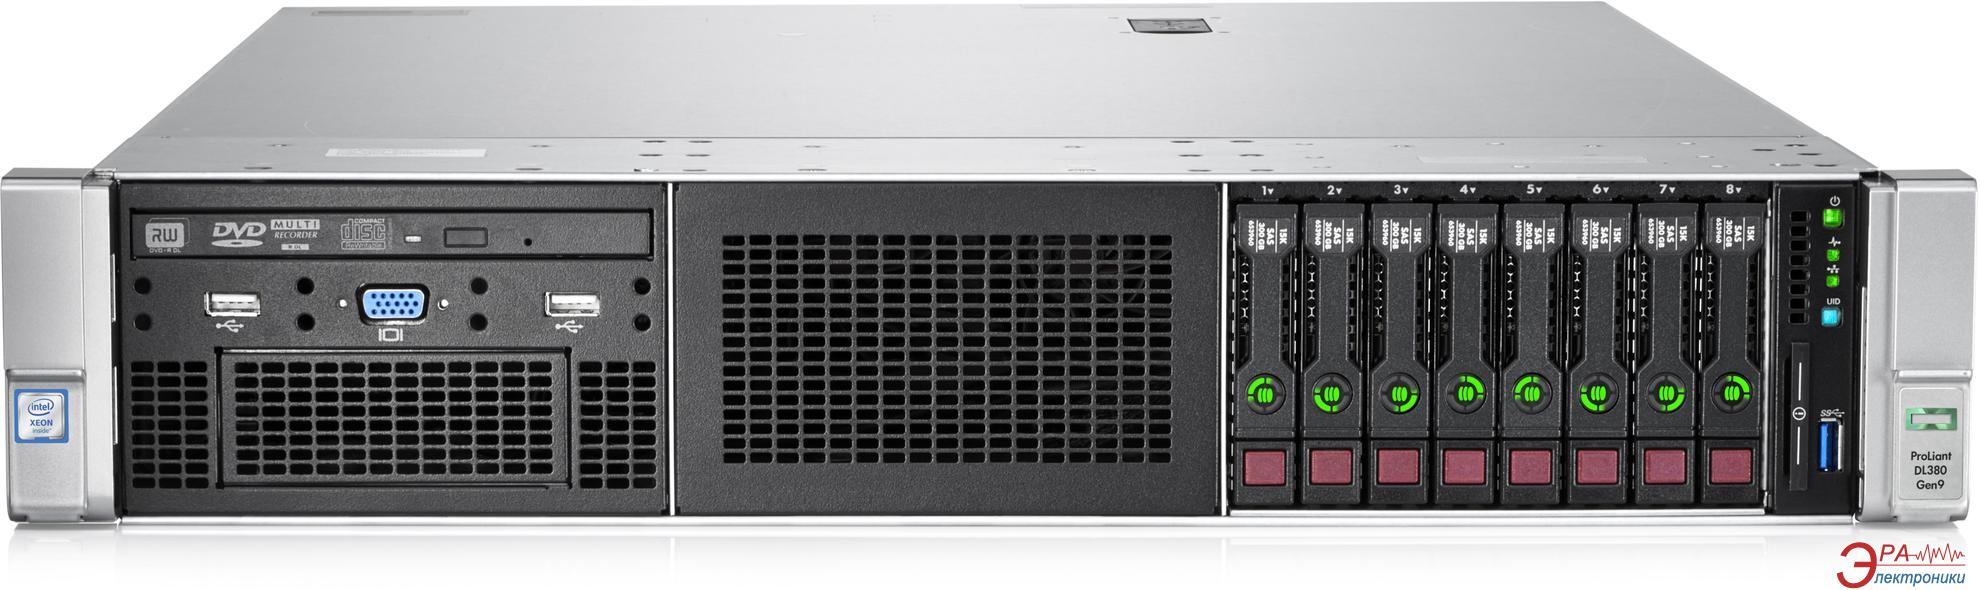 Сервер HP DL380 Gen9 (843557-425)